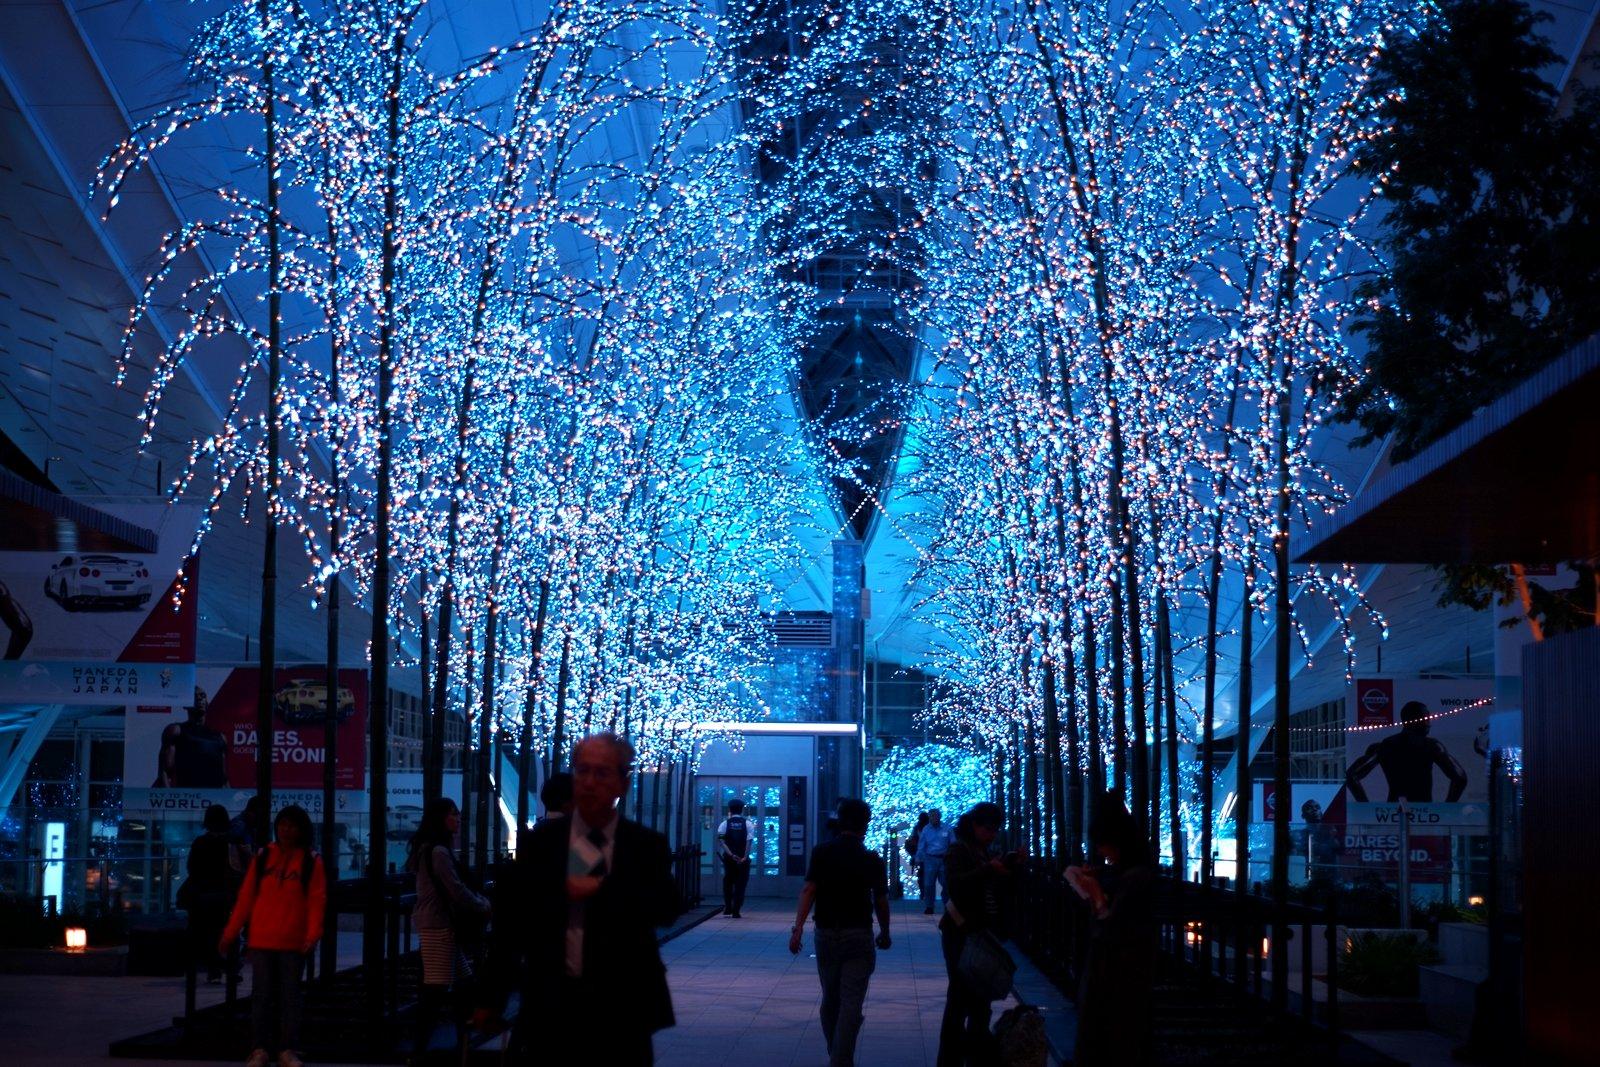 LEDのイルミネーションが輝く羽田空港